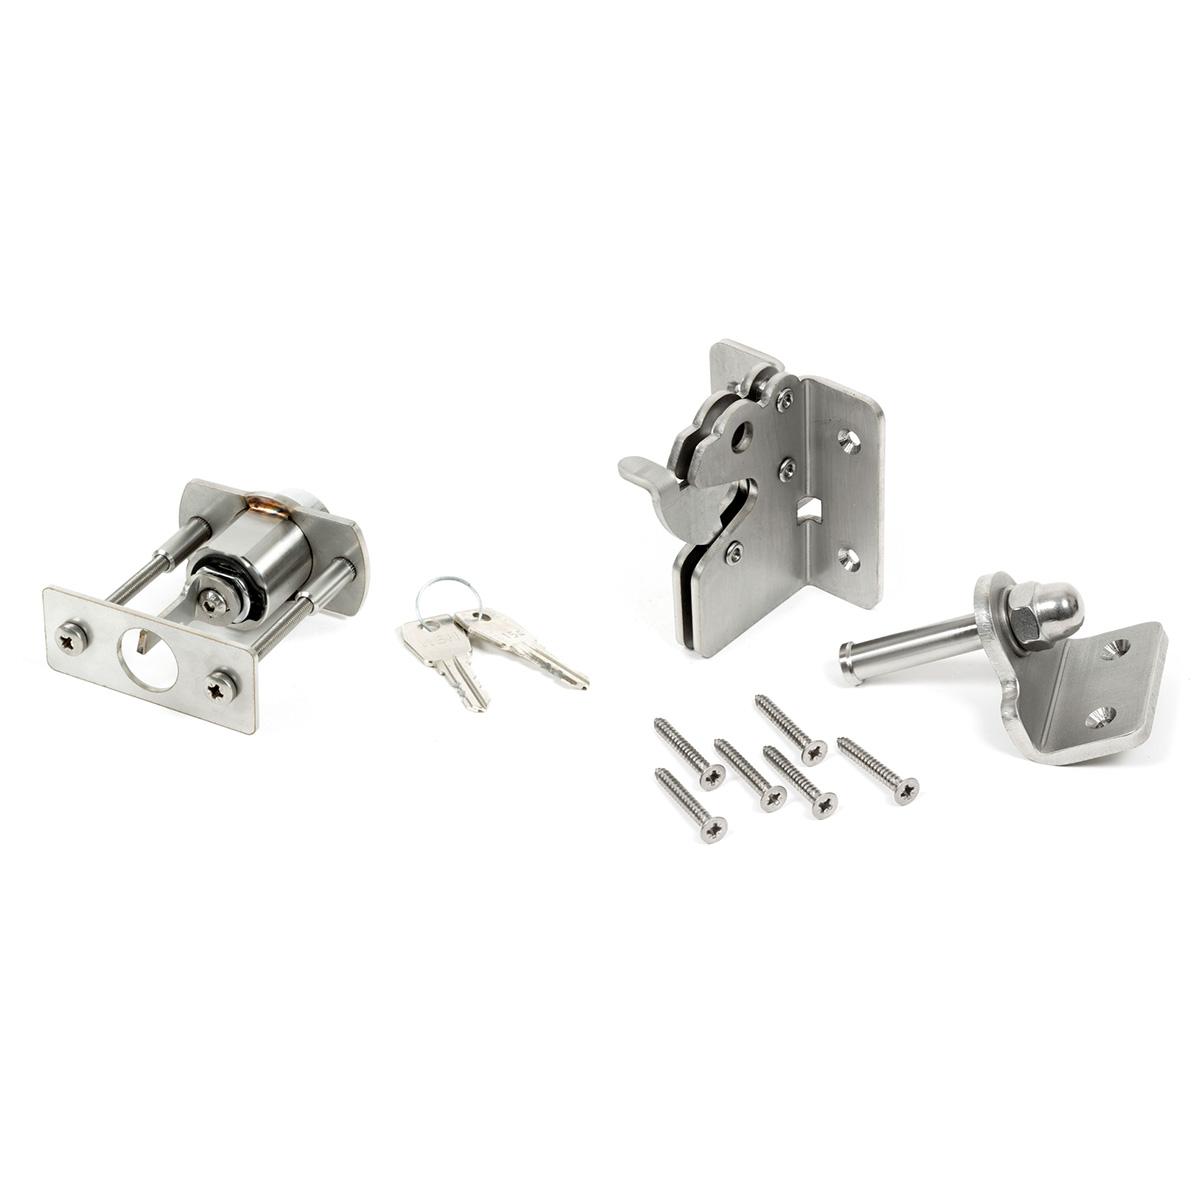 gate-latch-lockable-front-entry-latch-rear-entry